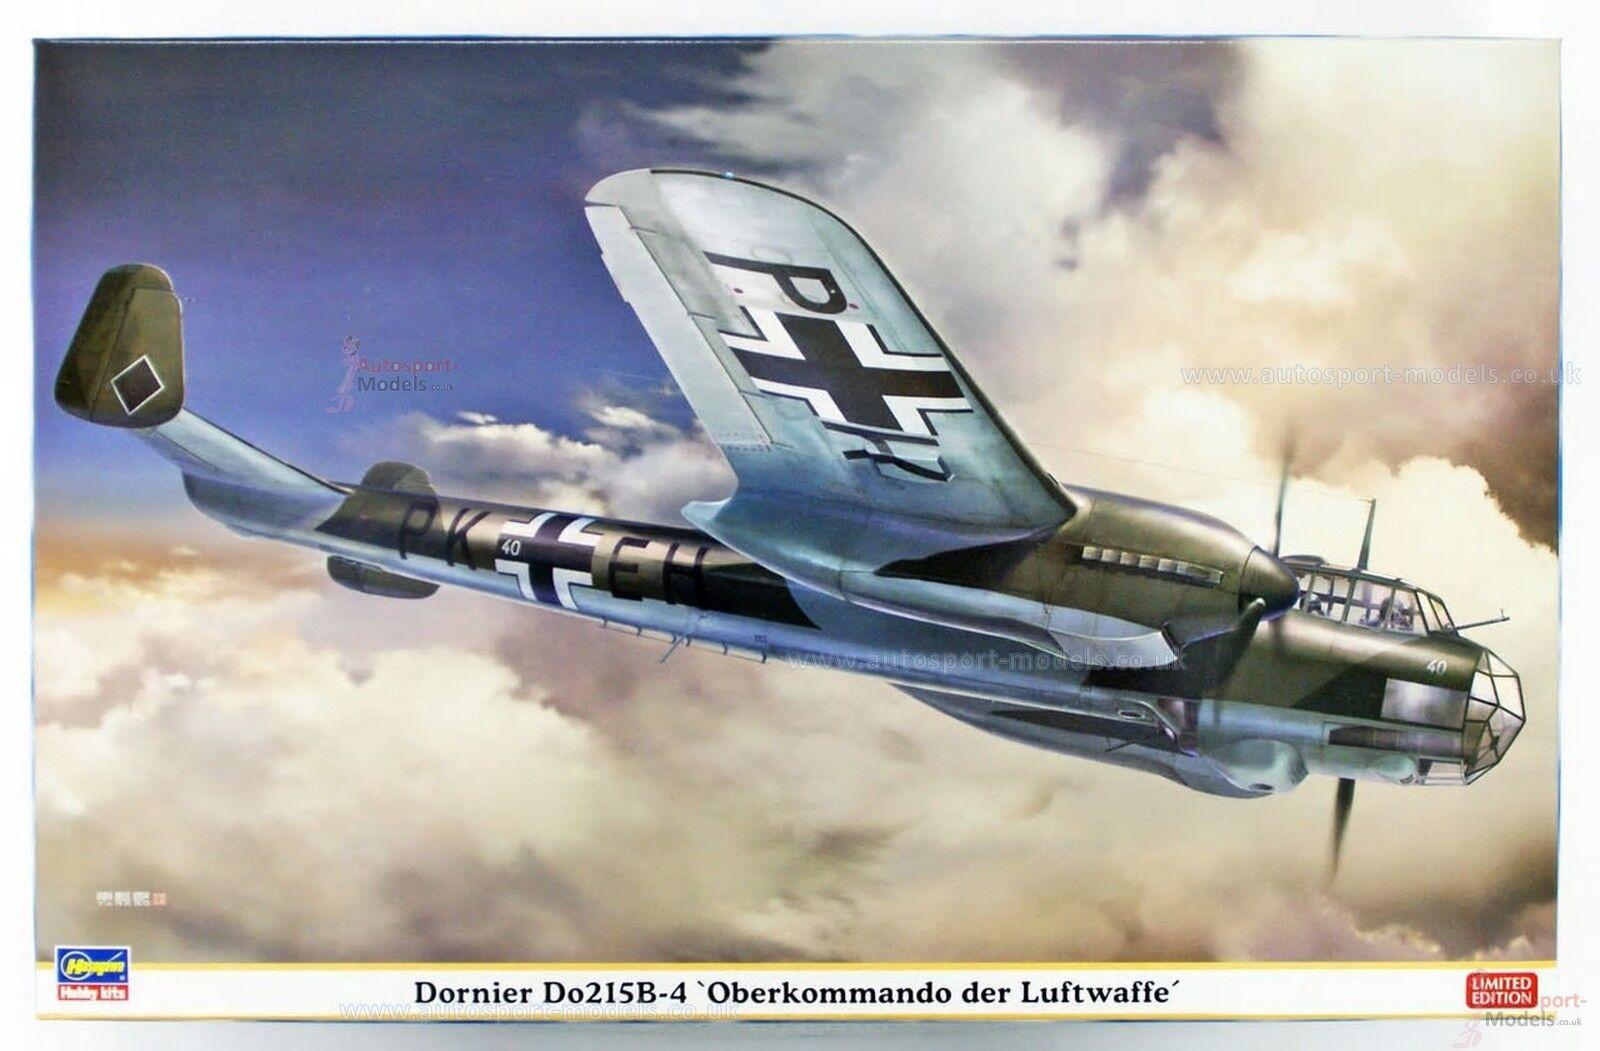 1 48 WWII Dornier Do215B-4 Oberkommando der Luftwaffe model kit by Hasegawa